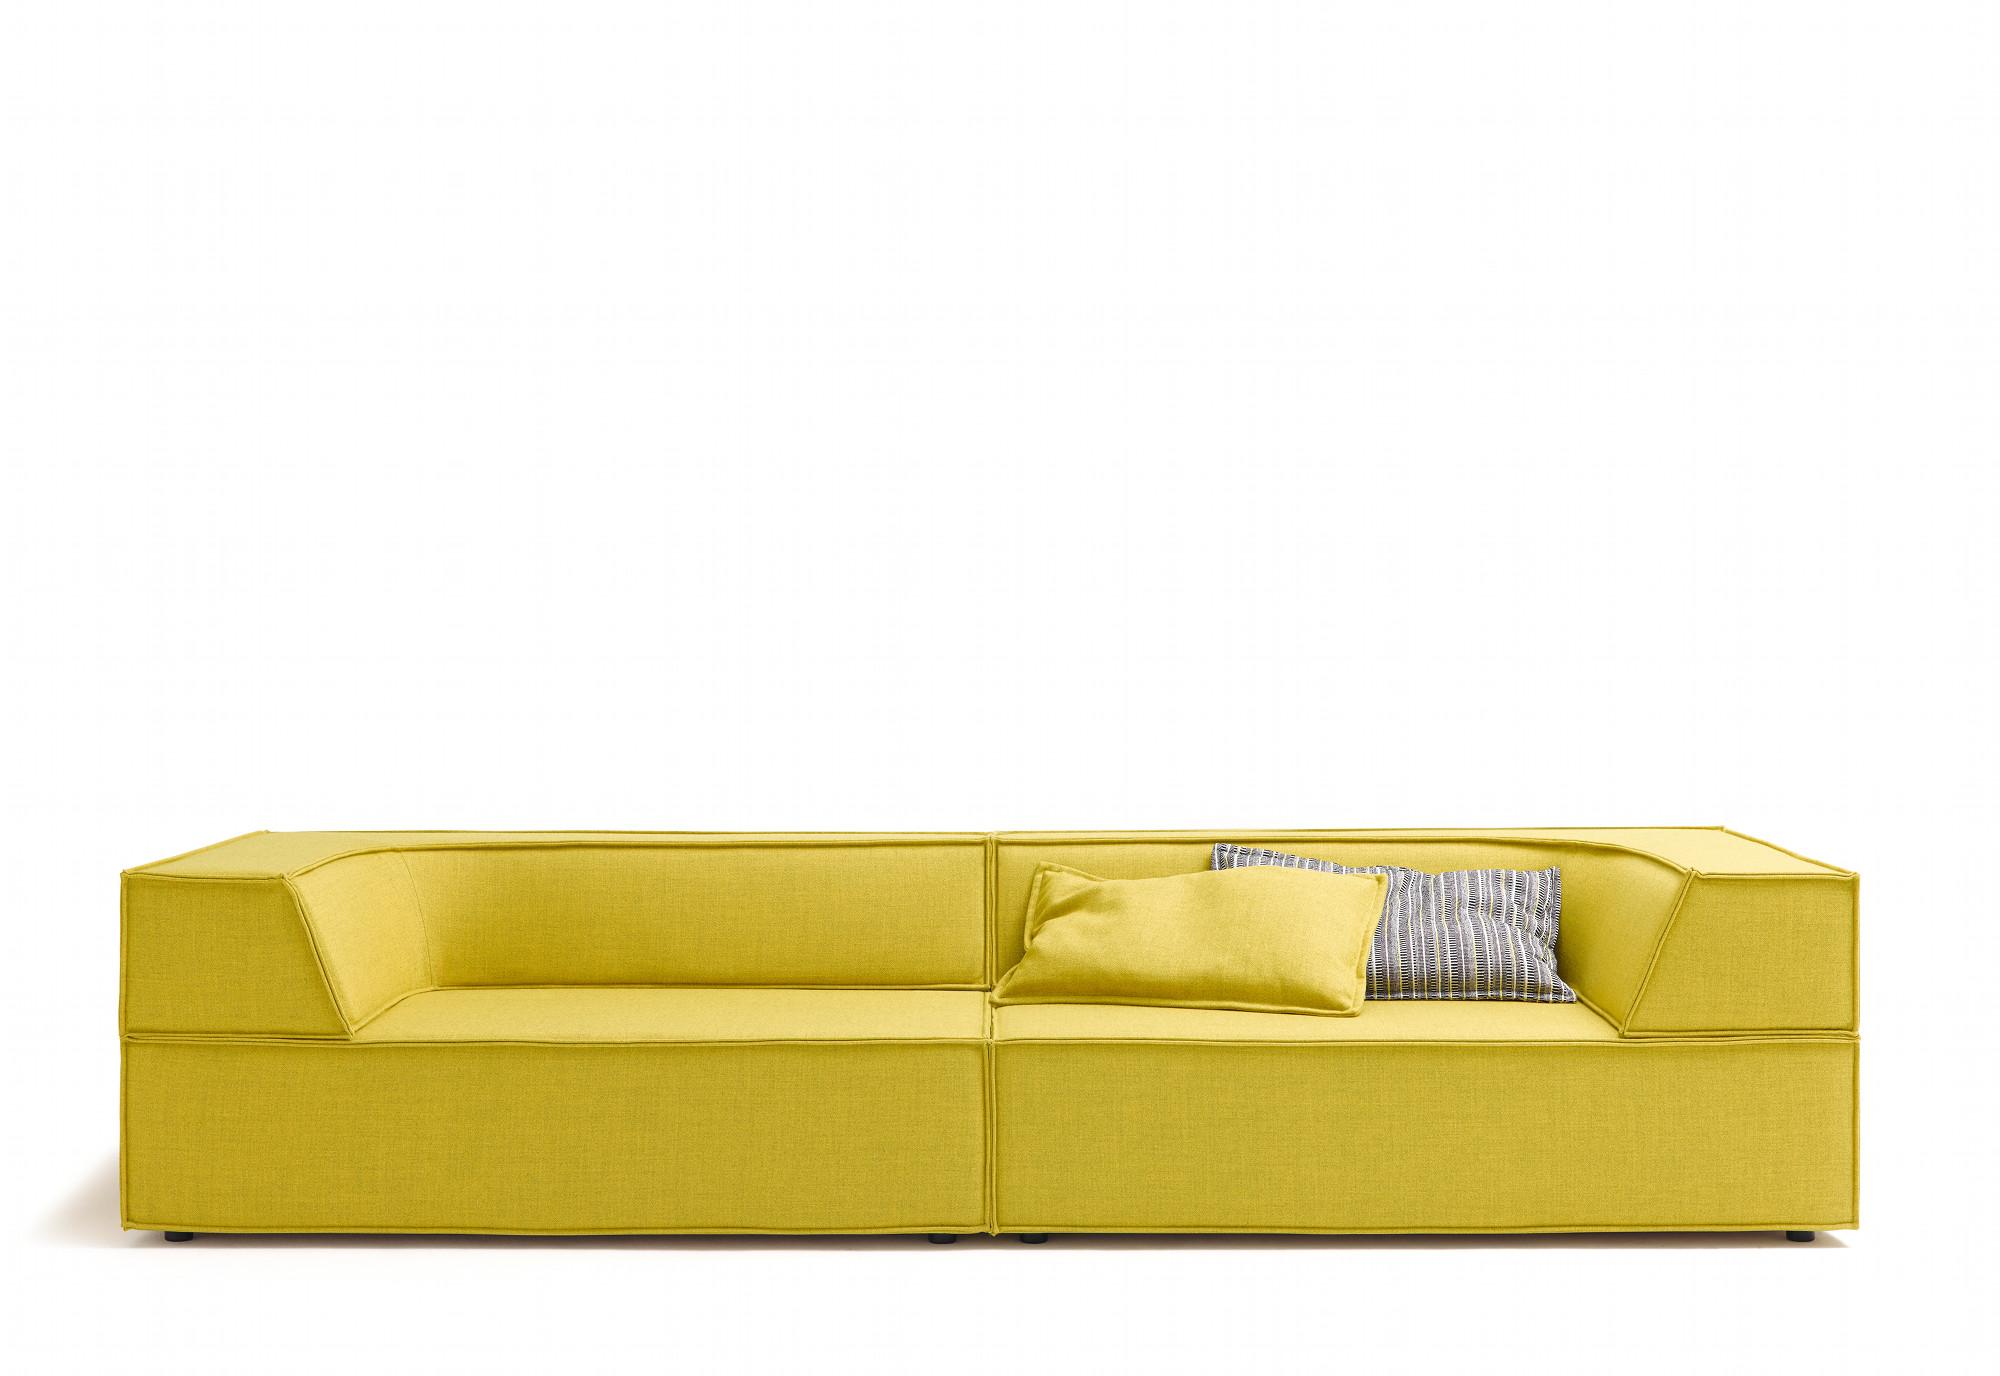 altes sofa entsorgen awesome sofa hussen gnstig hd wallpaper photos photos with altes sofa. Black Bedroom Furniture Sets. Home Design Ideas